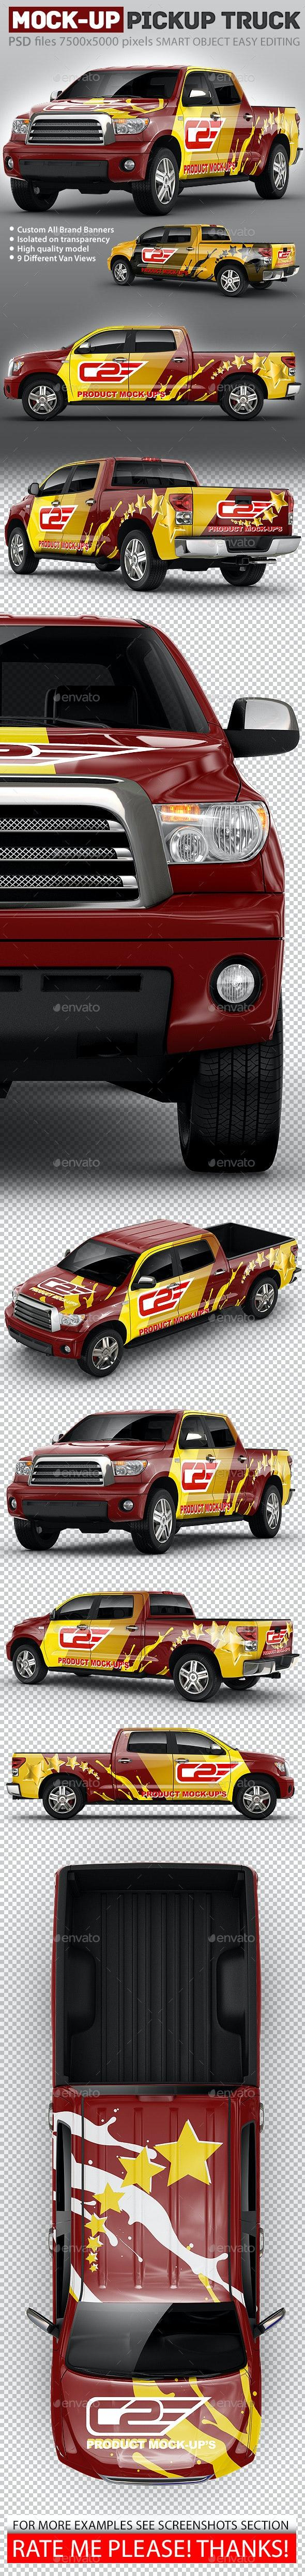 Pickup Mock-Up based on truck Toyota Tundra Crewmax - Vehicle Wraps Print